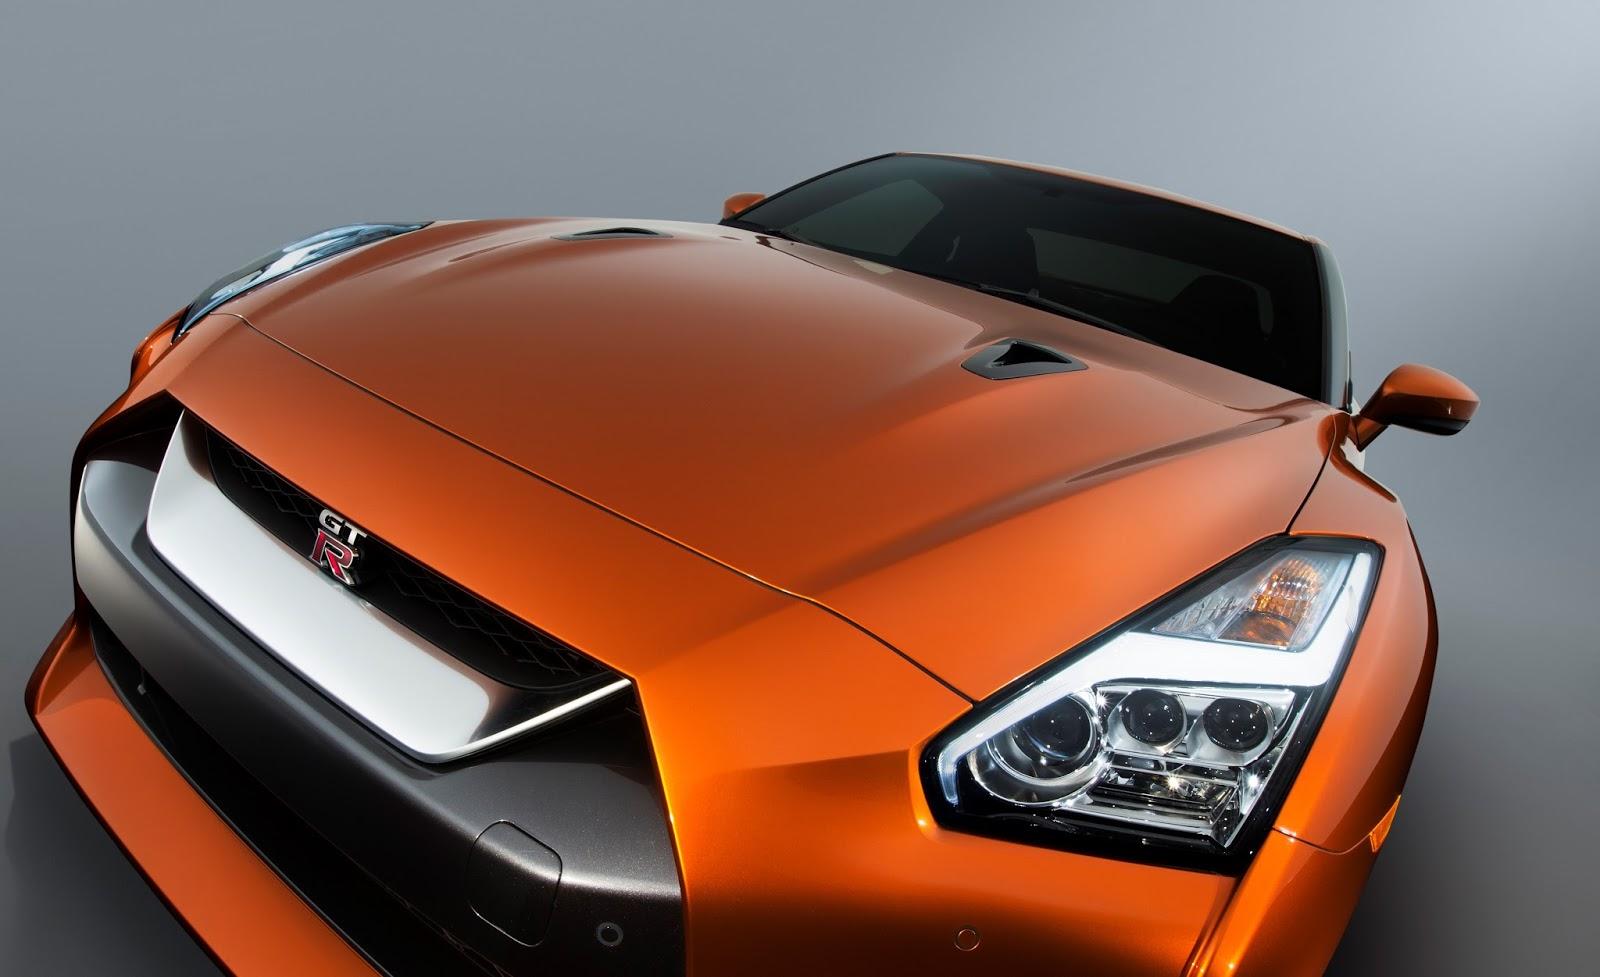 144071 1 5 Nissan GT-R: Ο Godzilla επέστρεψε! Godzilla, Nissan, Nissan GT-R, supercars, έκθεση Νέας Υόρκης